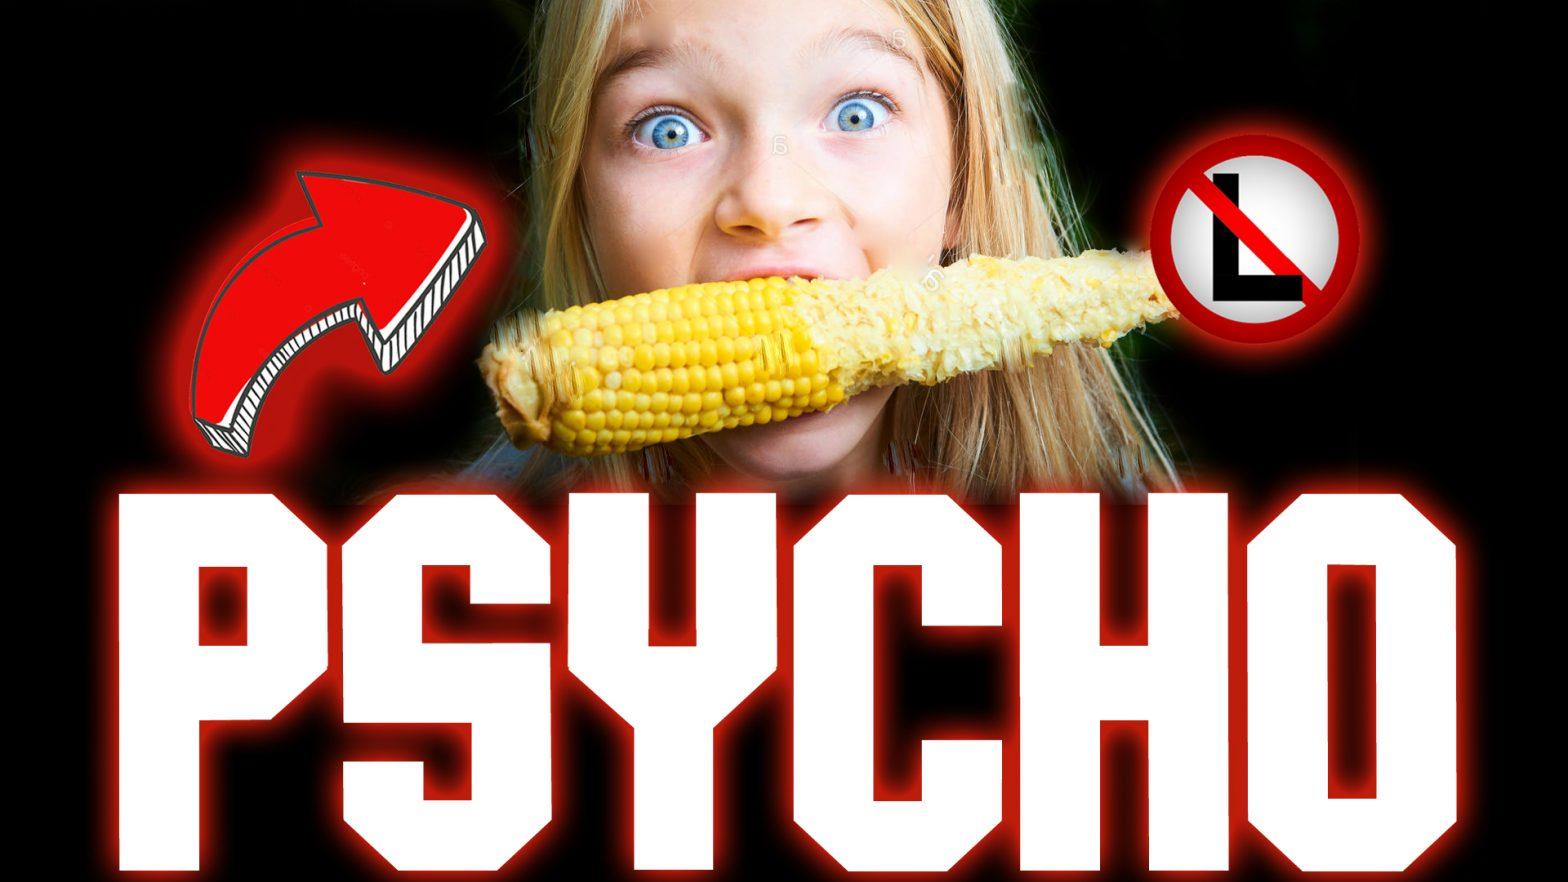 psycho corn lectin detox paleo